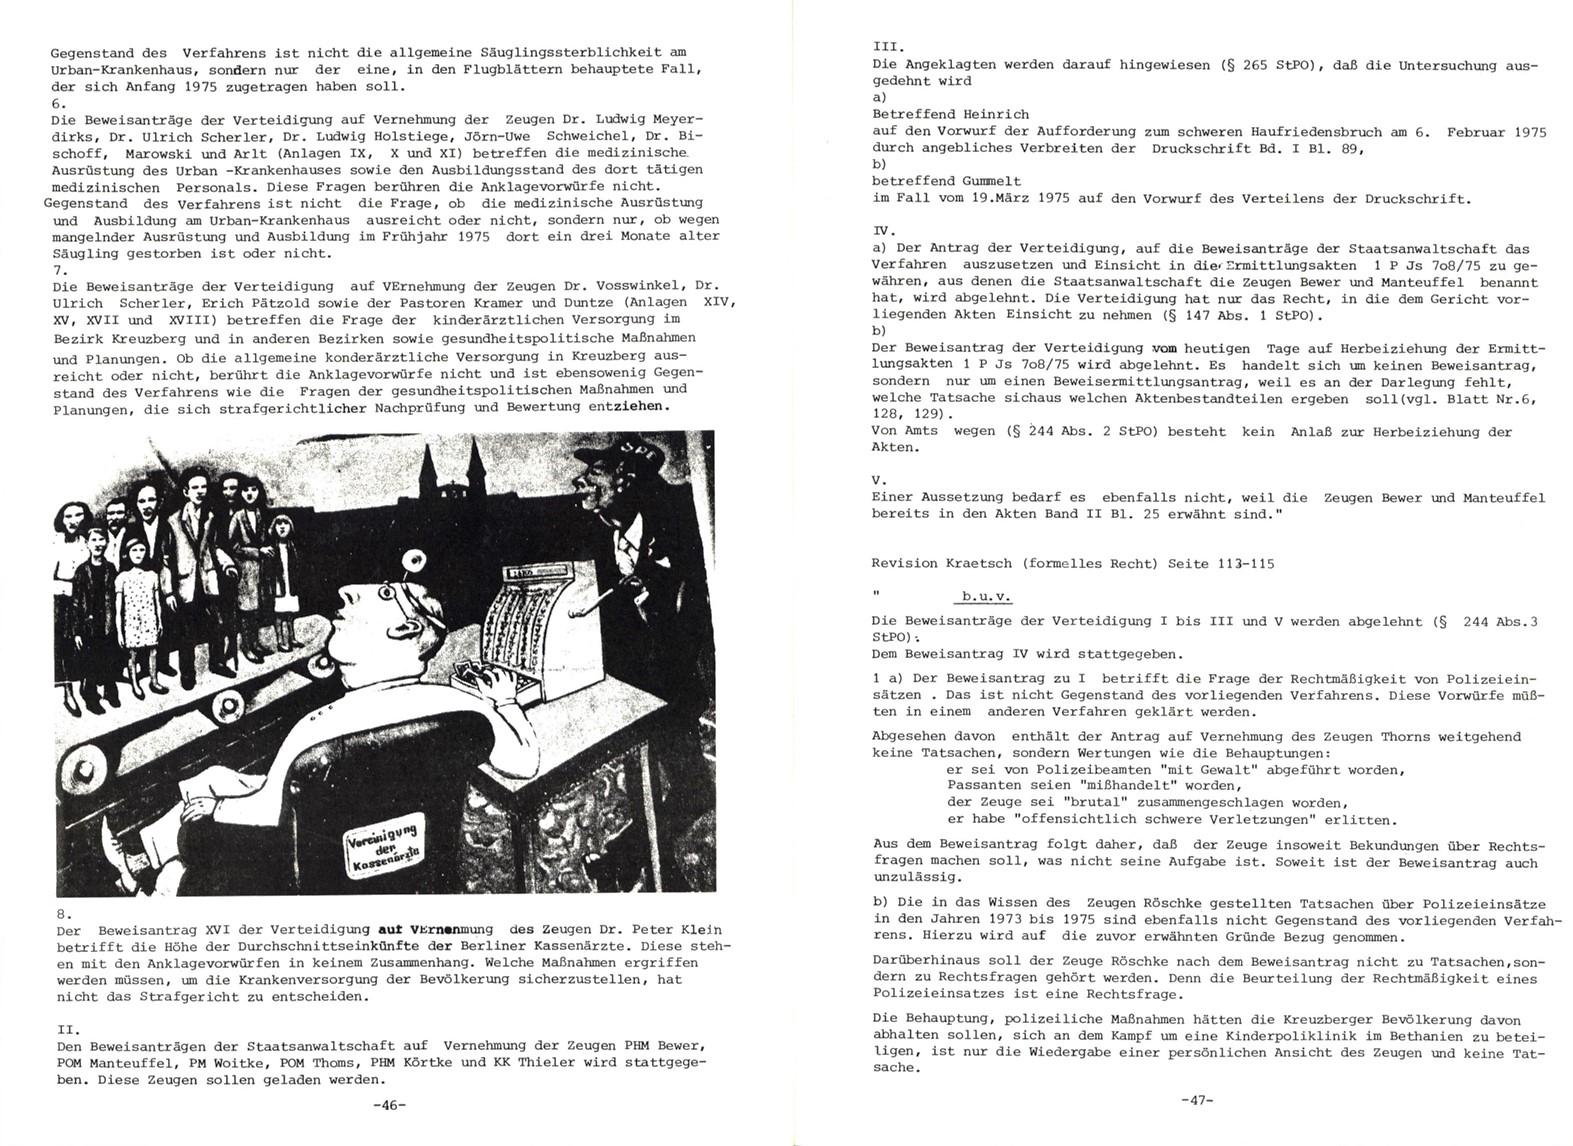 KPDAO_1976_Staatsschutzparagrafen_24